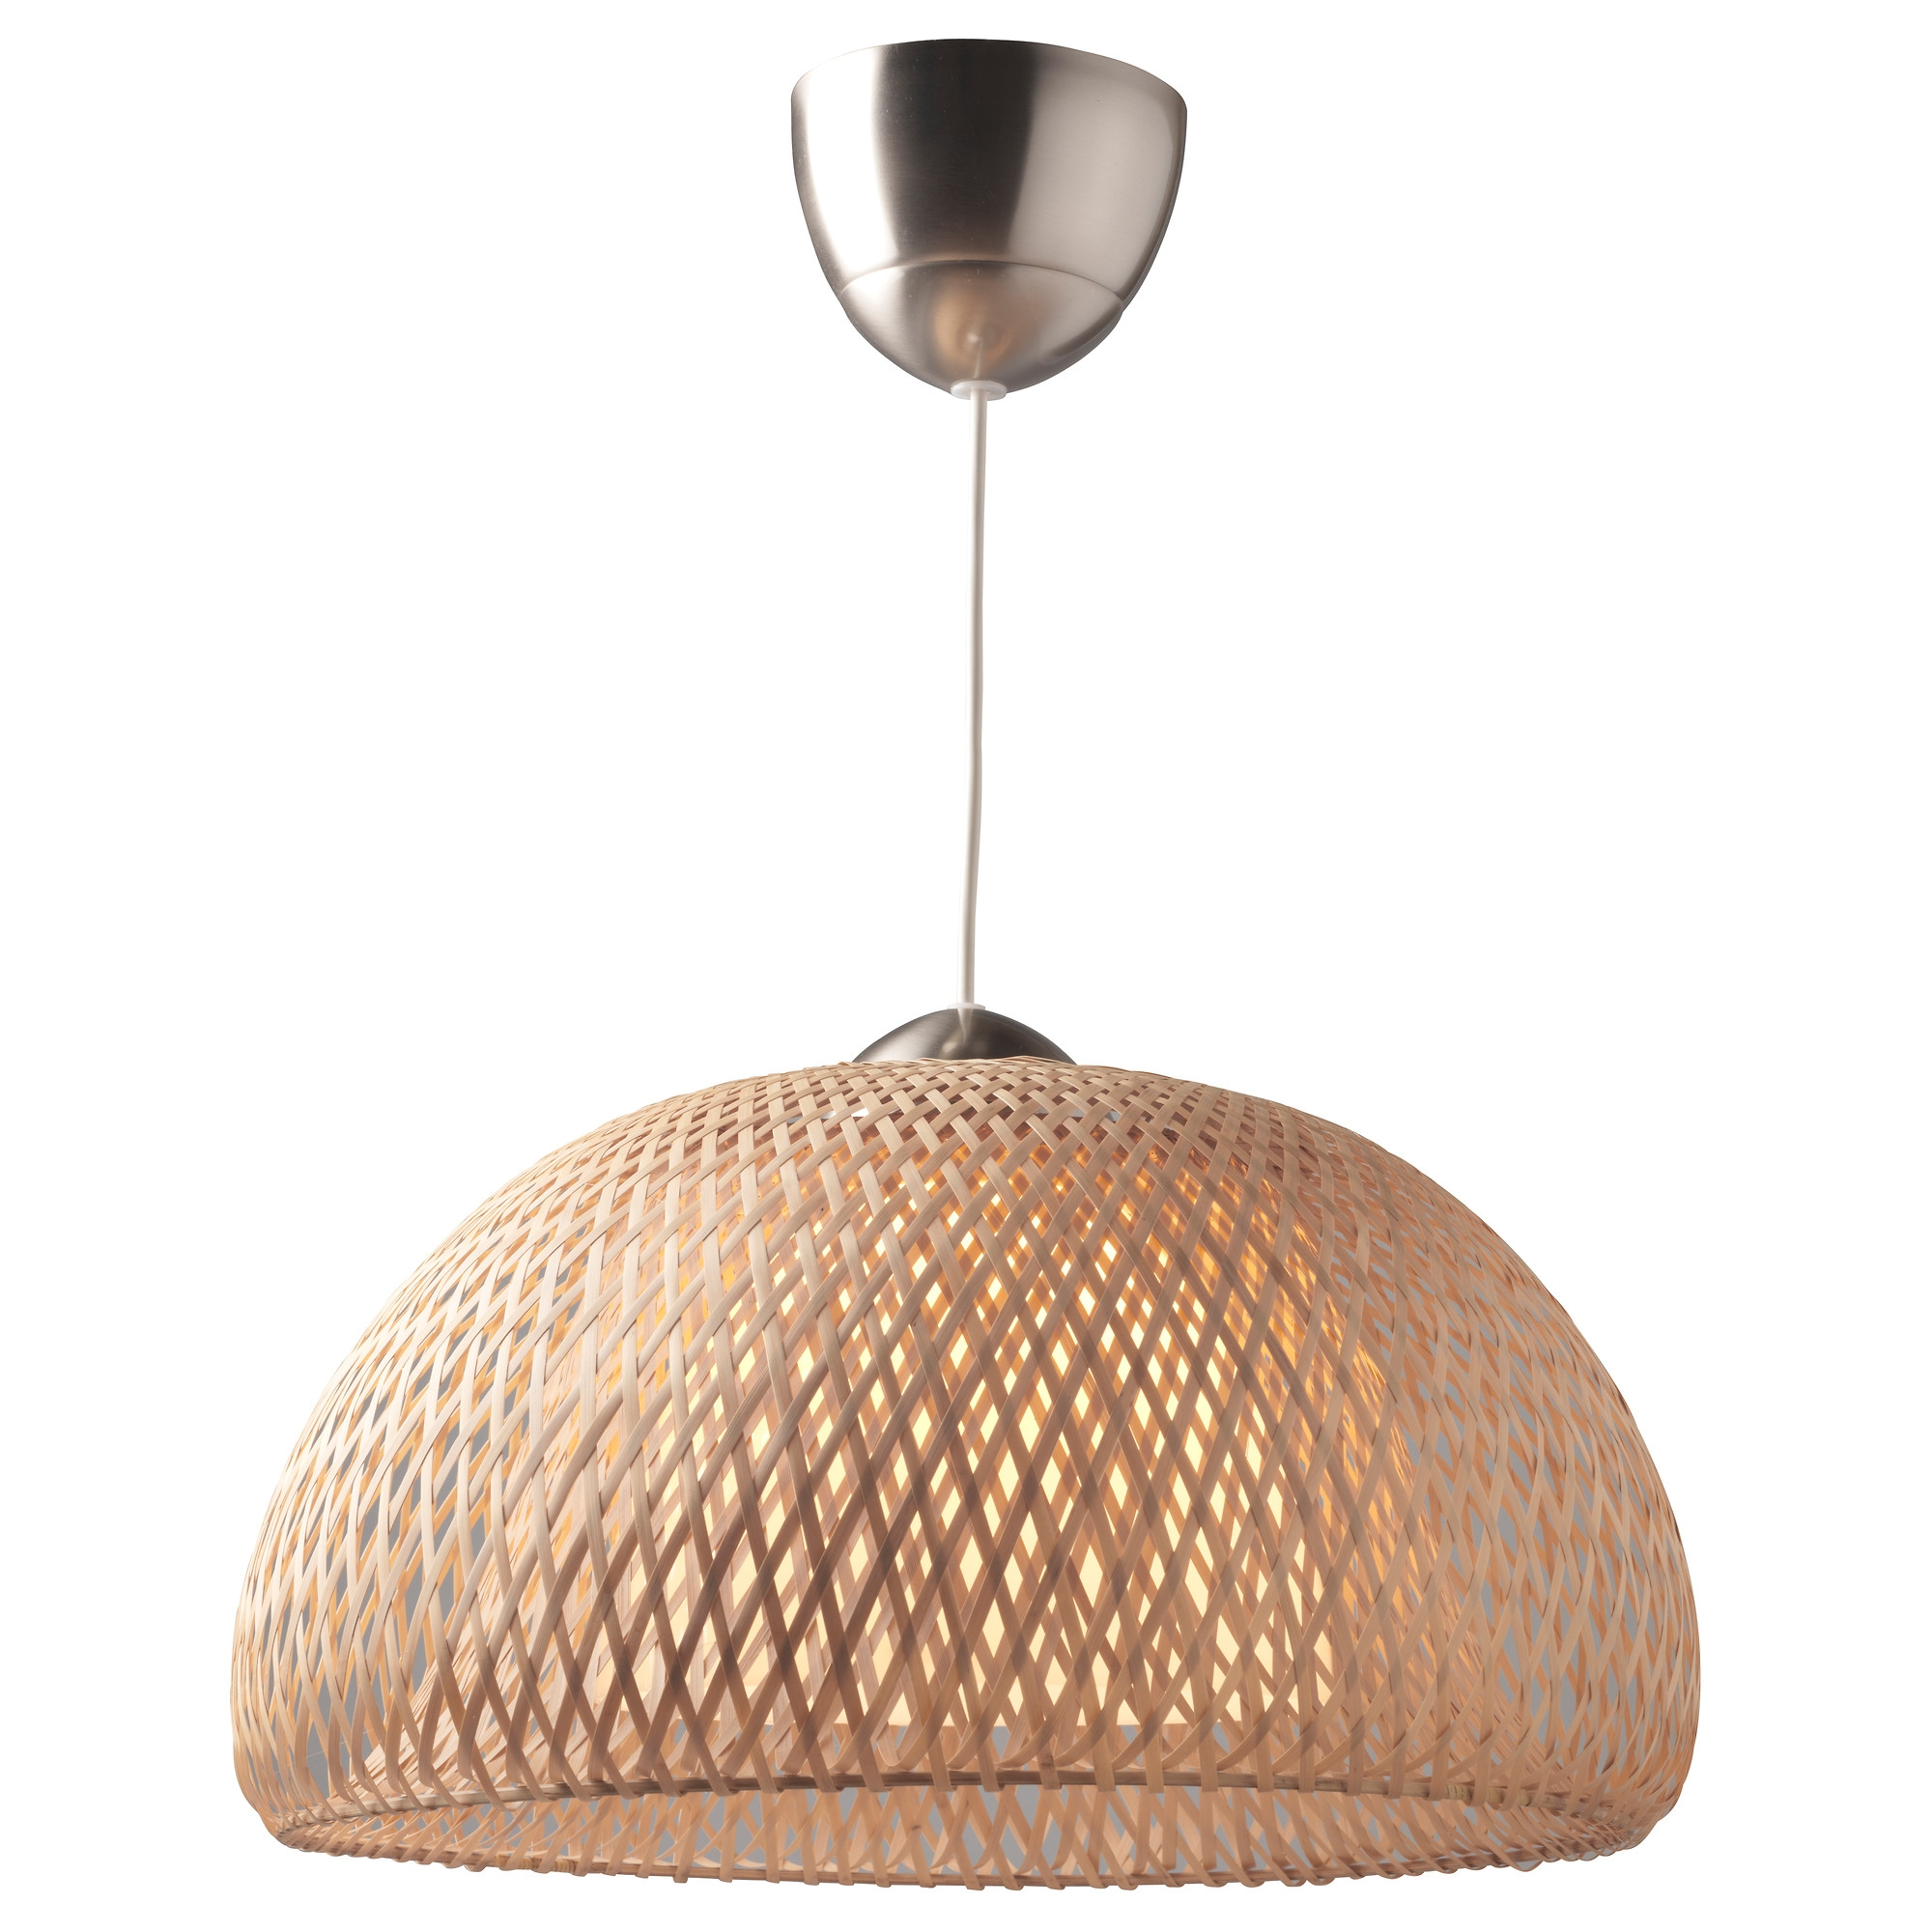 BÖJA lámpara de techo ratán natural